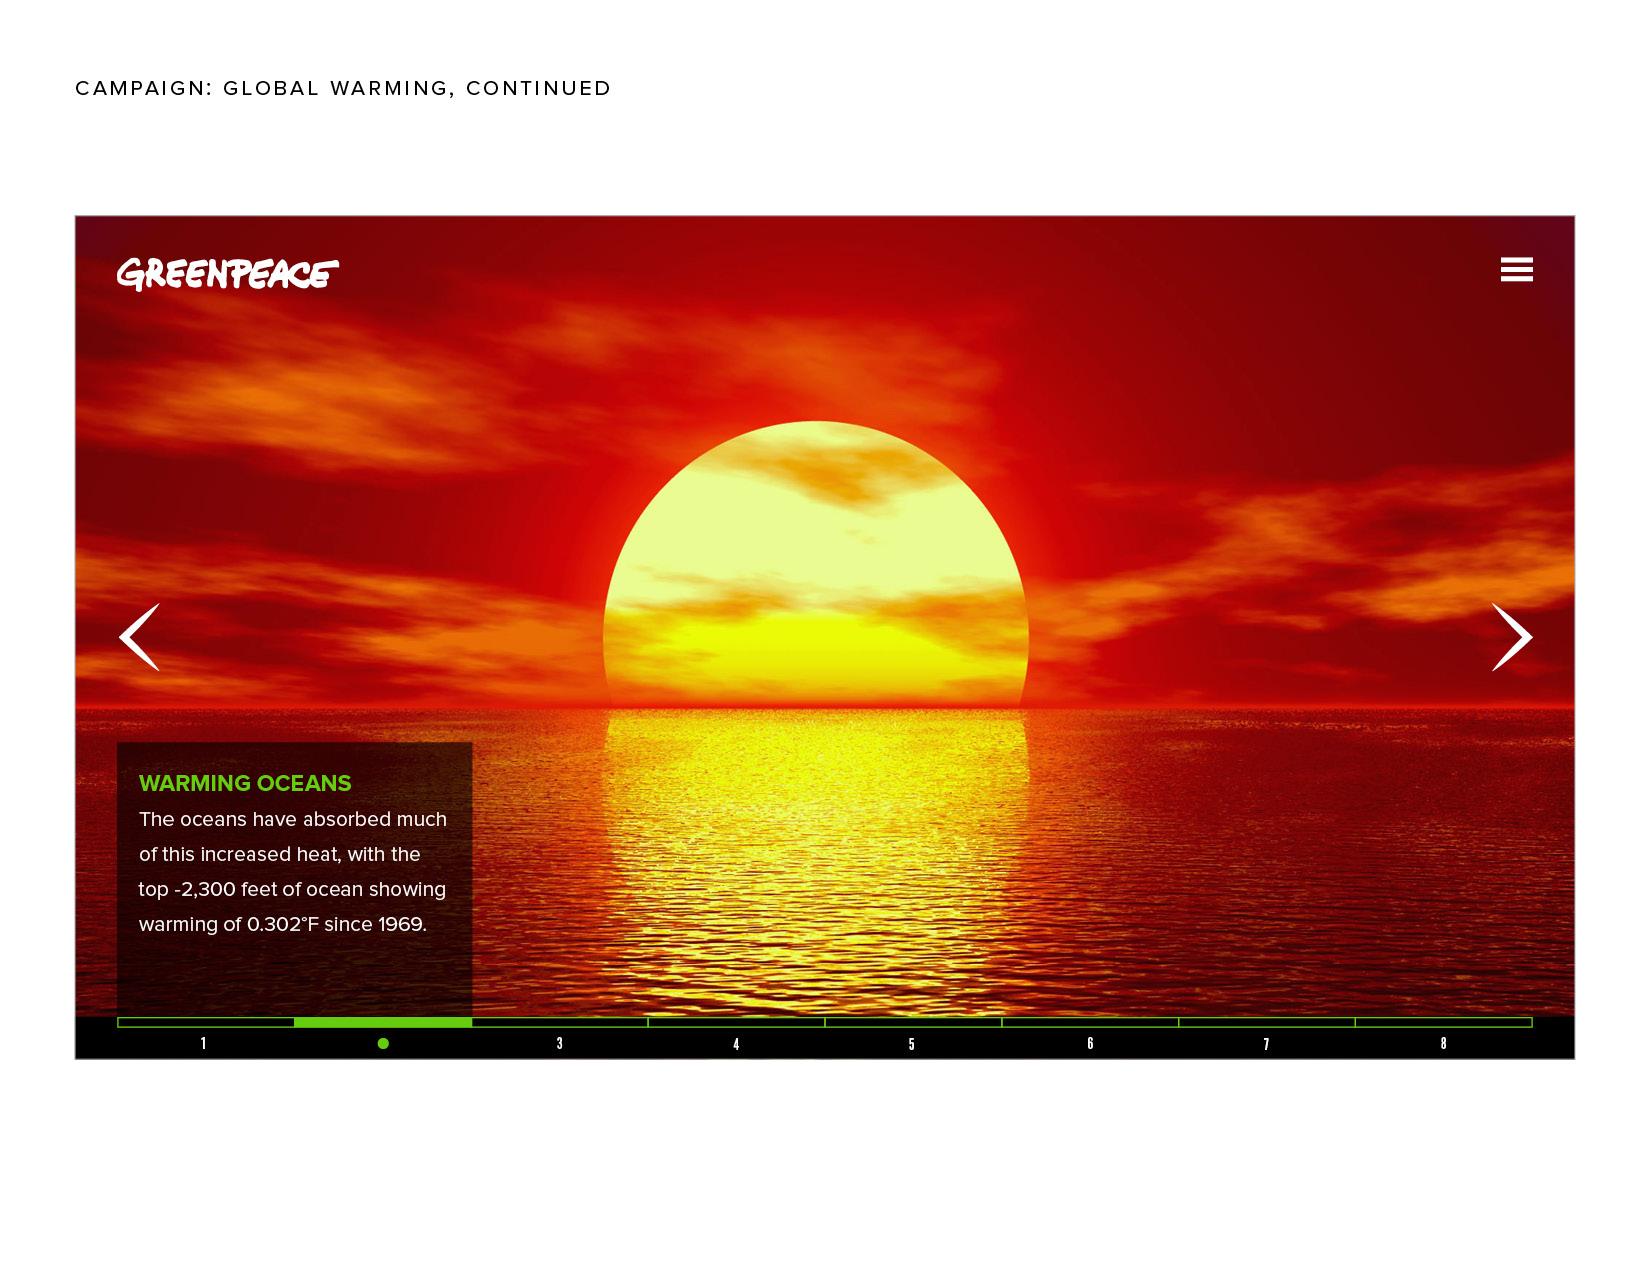 greenpeace21.jpg